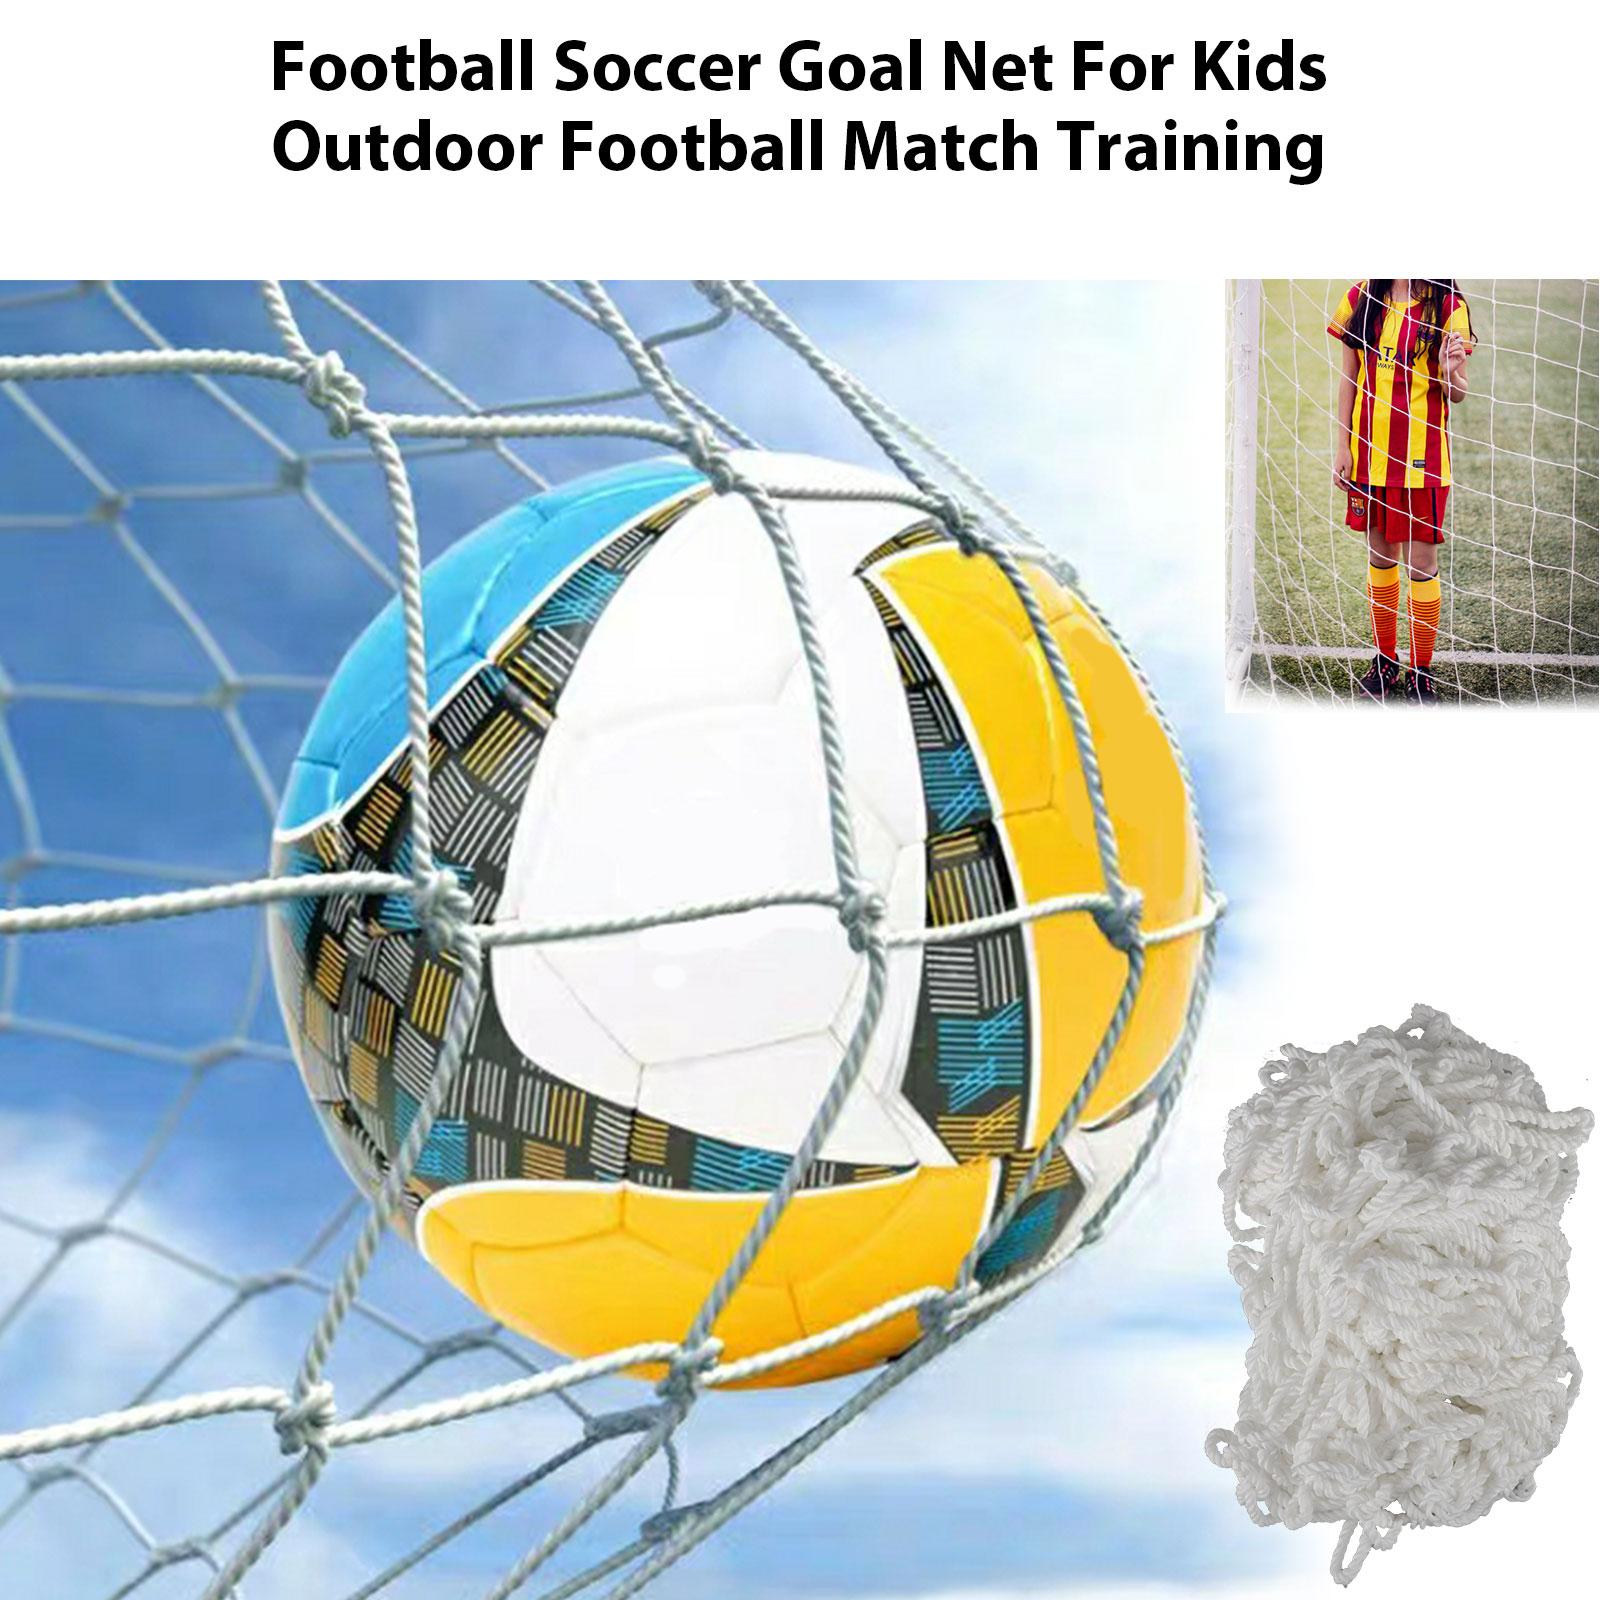 6-4ft-PE-Football-Soccer-Goal-Net-Outdoor-Backyard-Sport-Match-Training-for-Kids thumbnail 2